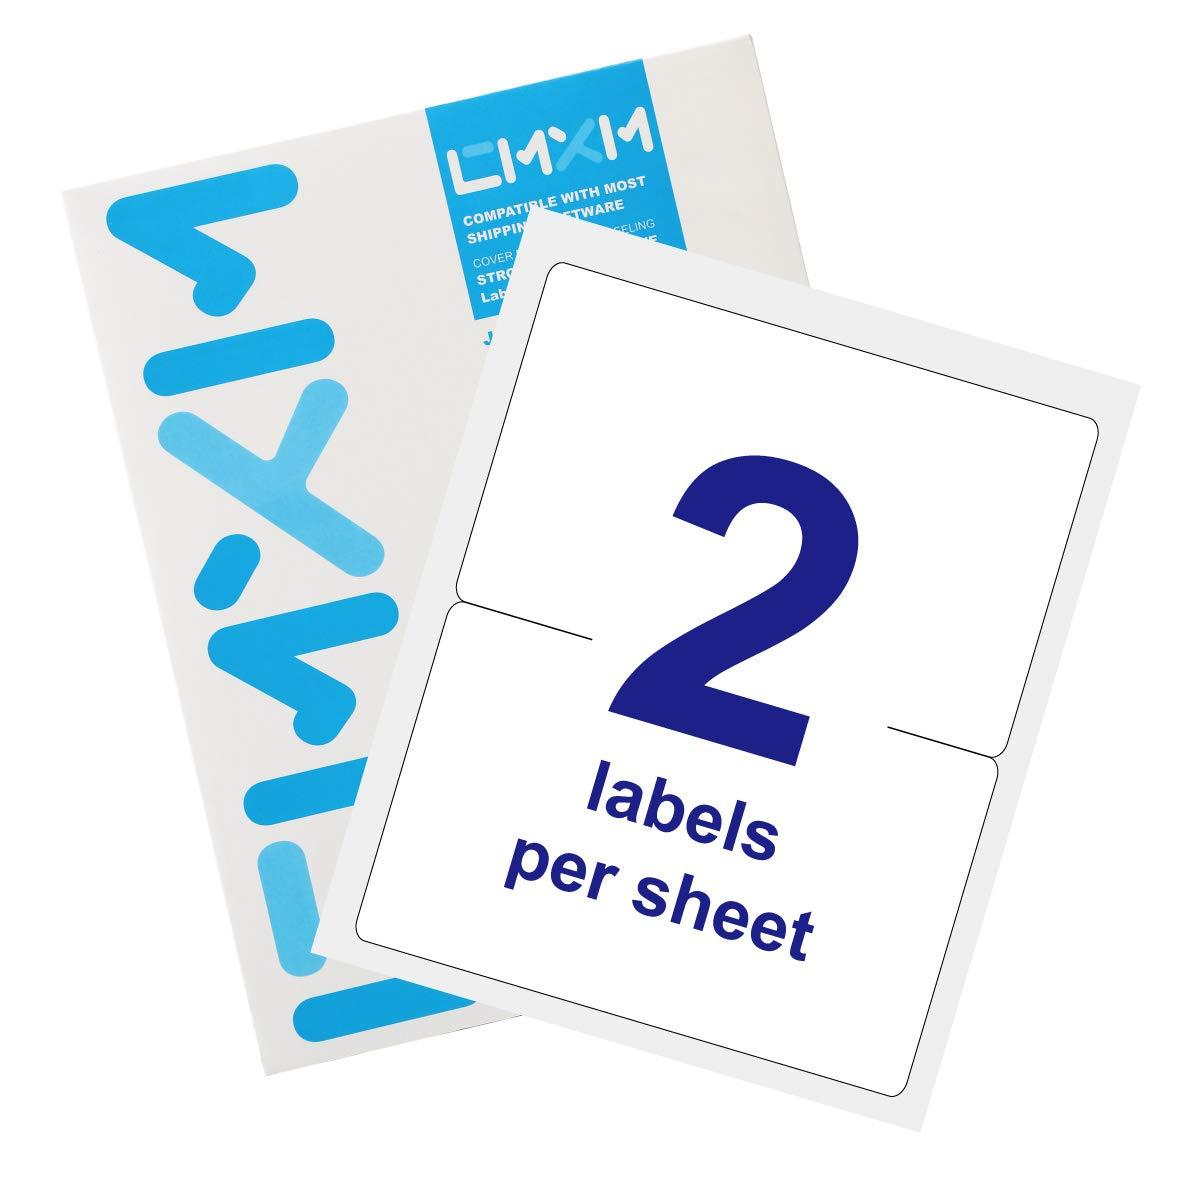 CMXM Easy Take Address Labels for Laser & Inkjet Printers 8-1/2'' x 5-1/2'',200 Labels